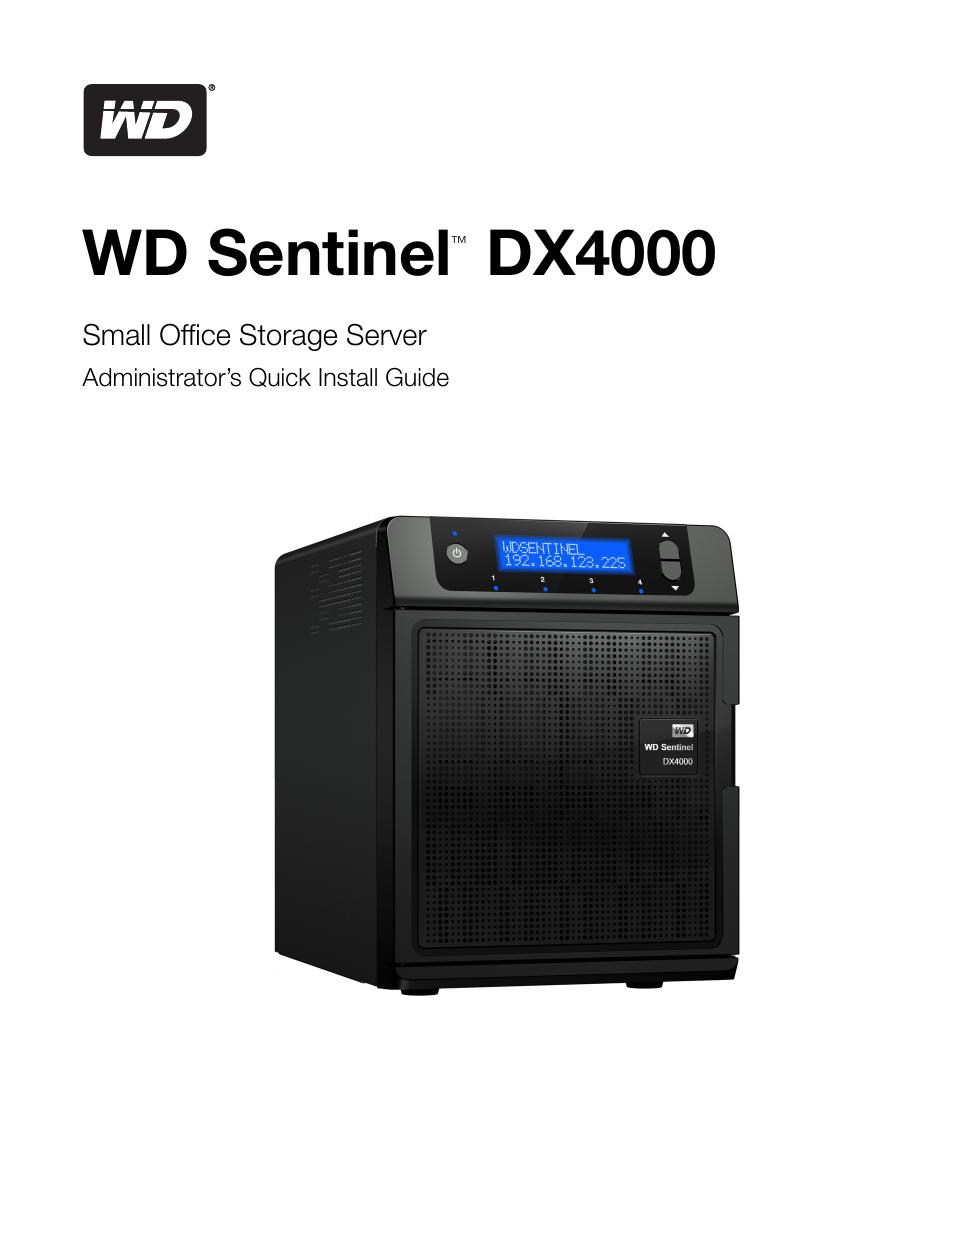 Wd Sentinel Dx4000 Small Office Storage Server Manualzz